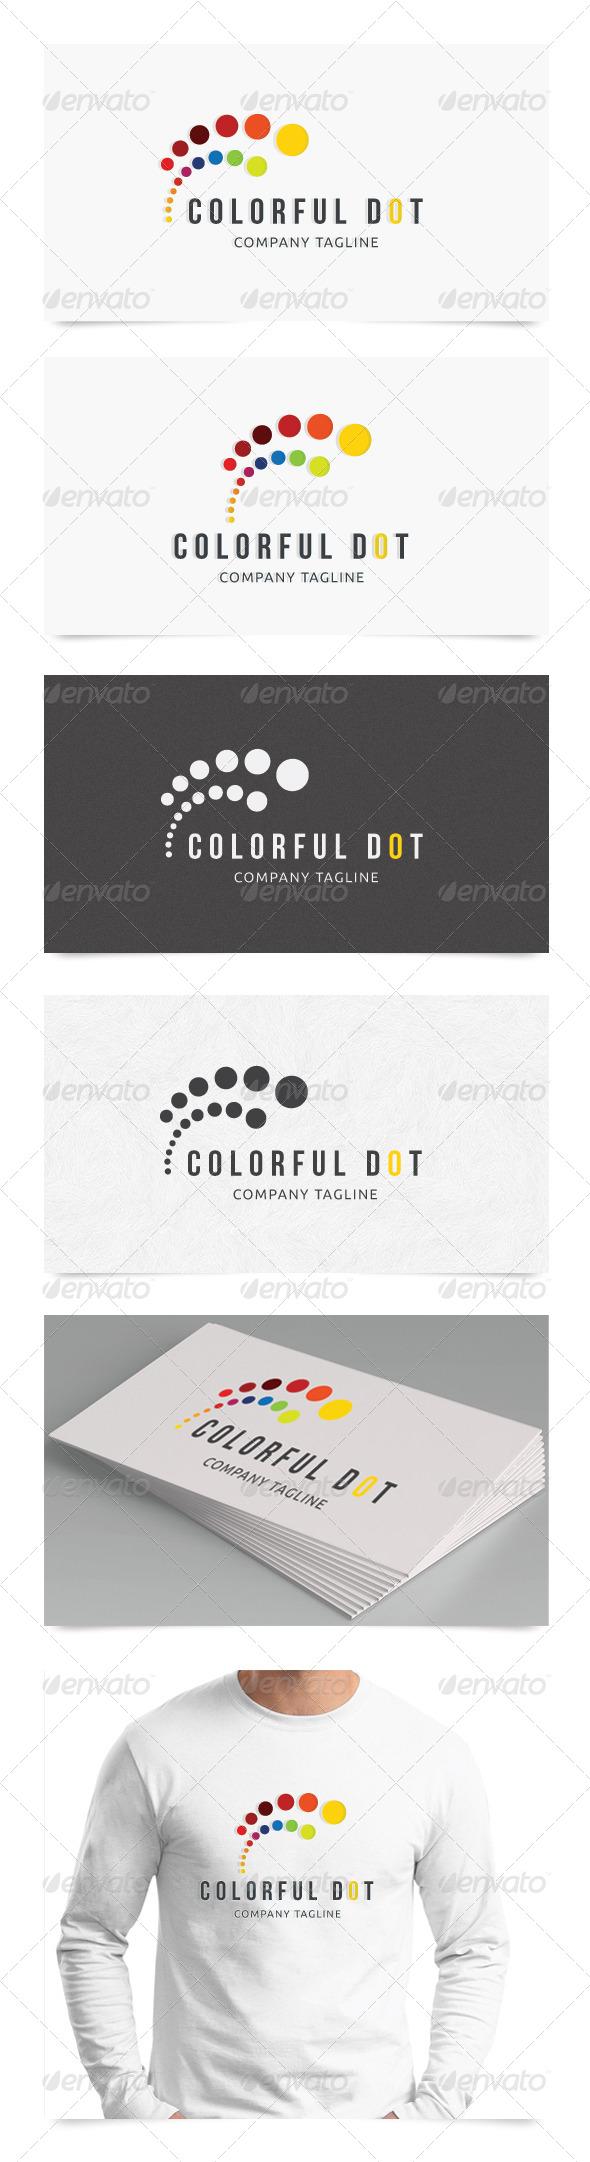 GraphicRiver Colorful Dot 5048660